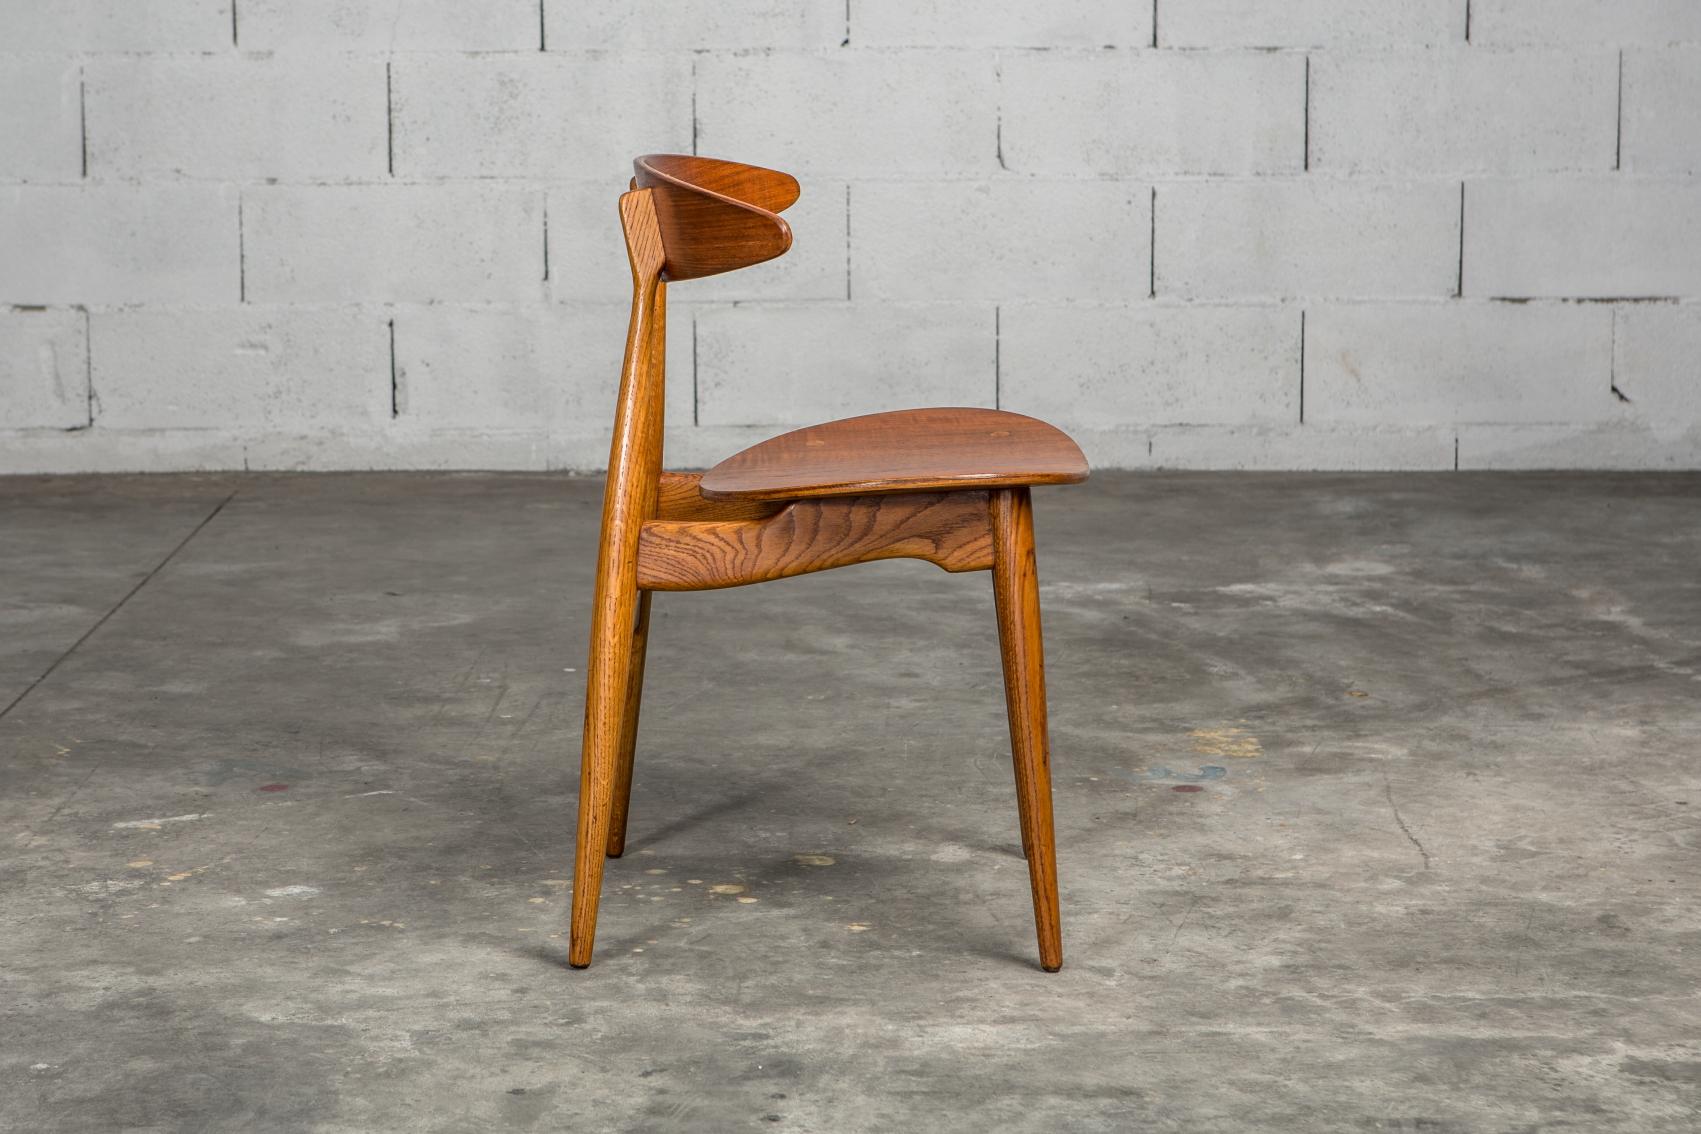 Molded teak backrests and oak frames CH 33 chairs - Hans J. Wegner for Carl Hansen & Son - Side view